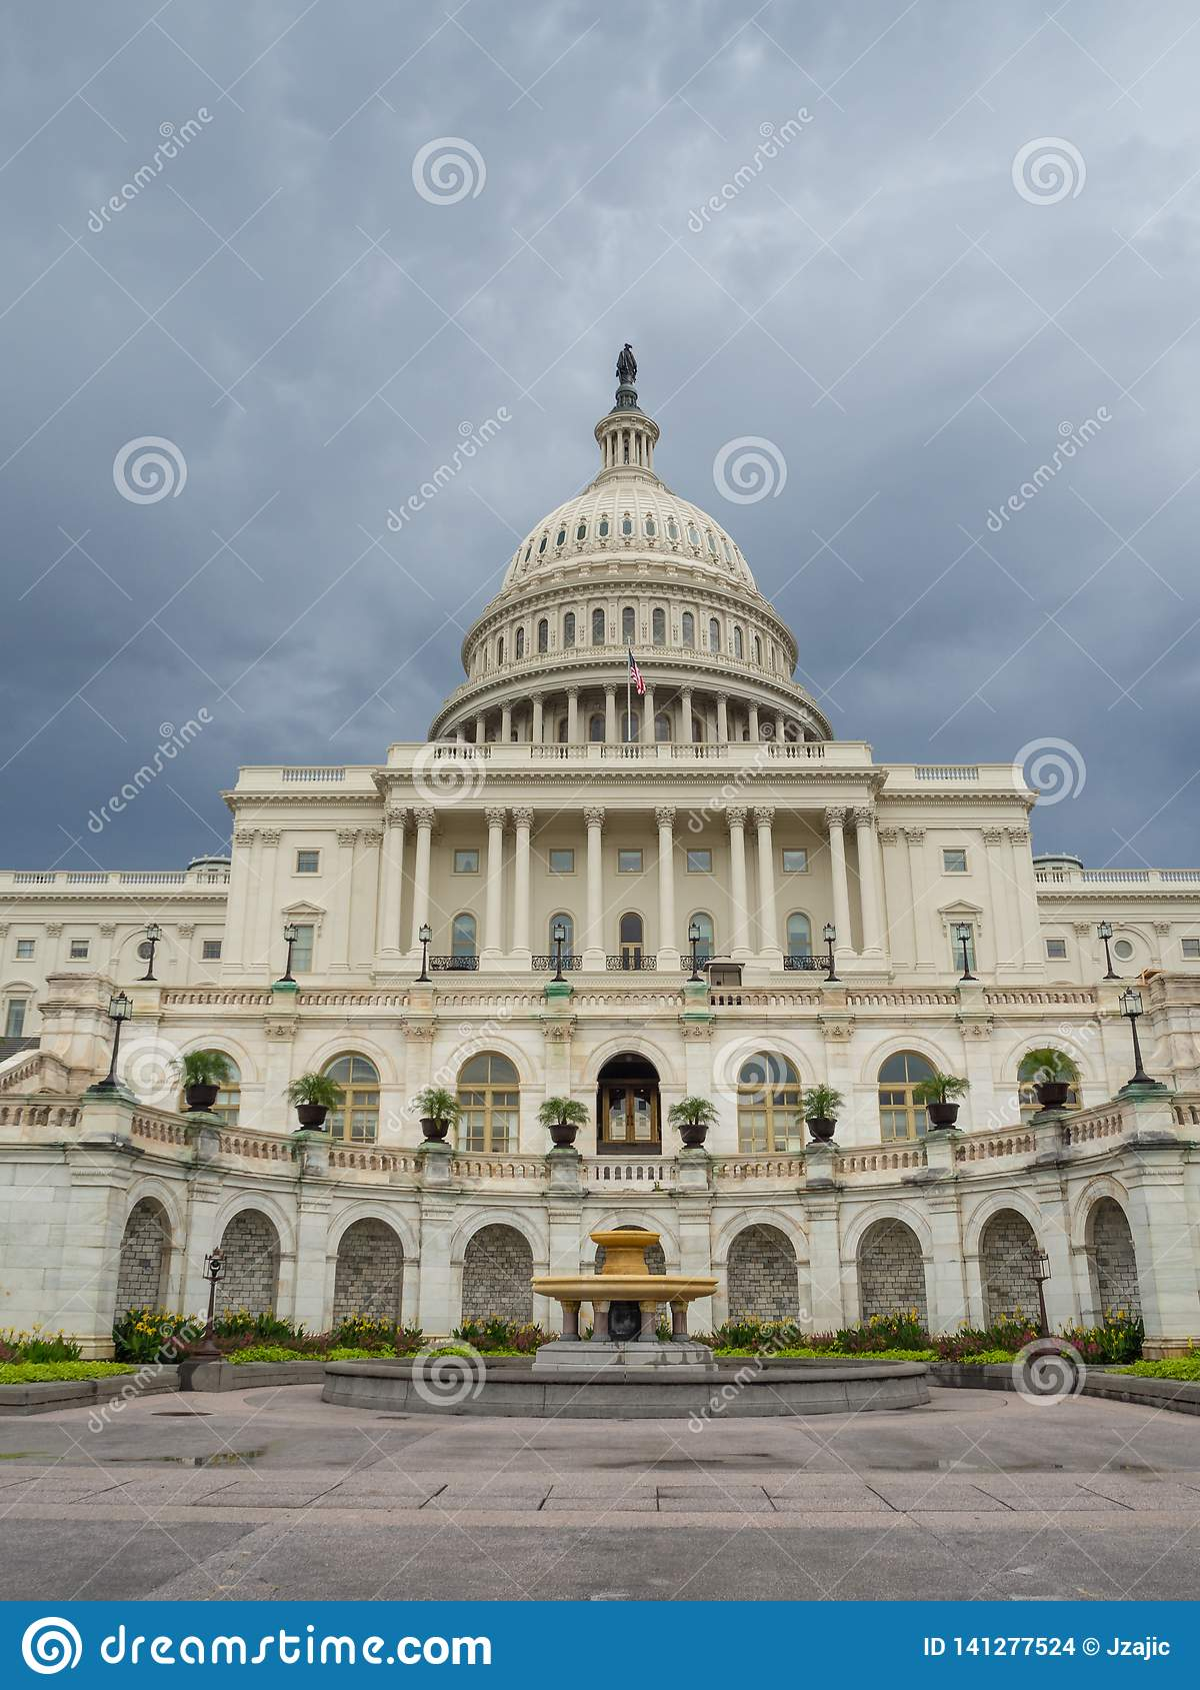 Washington DC, Περιοχή της Κολούμπια [Ηνωμένο ΗΠΑ Capitol κτήριο, σκιερός νεφελώδης καιρός πρίν βρέχει, faling σούρουπο